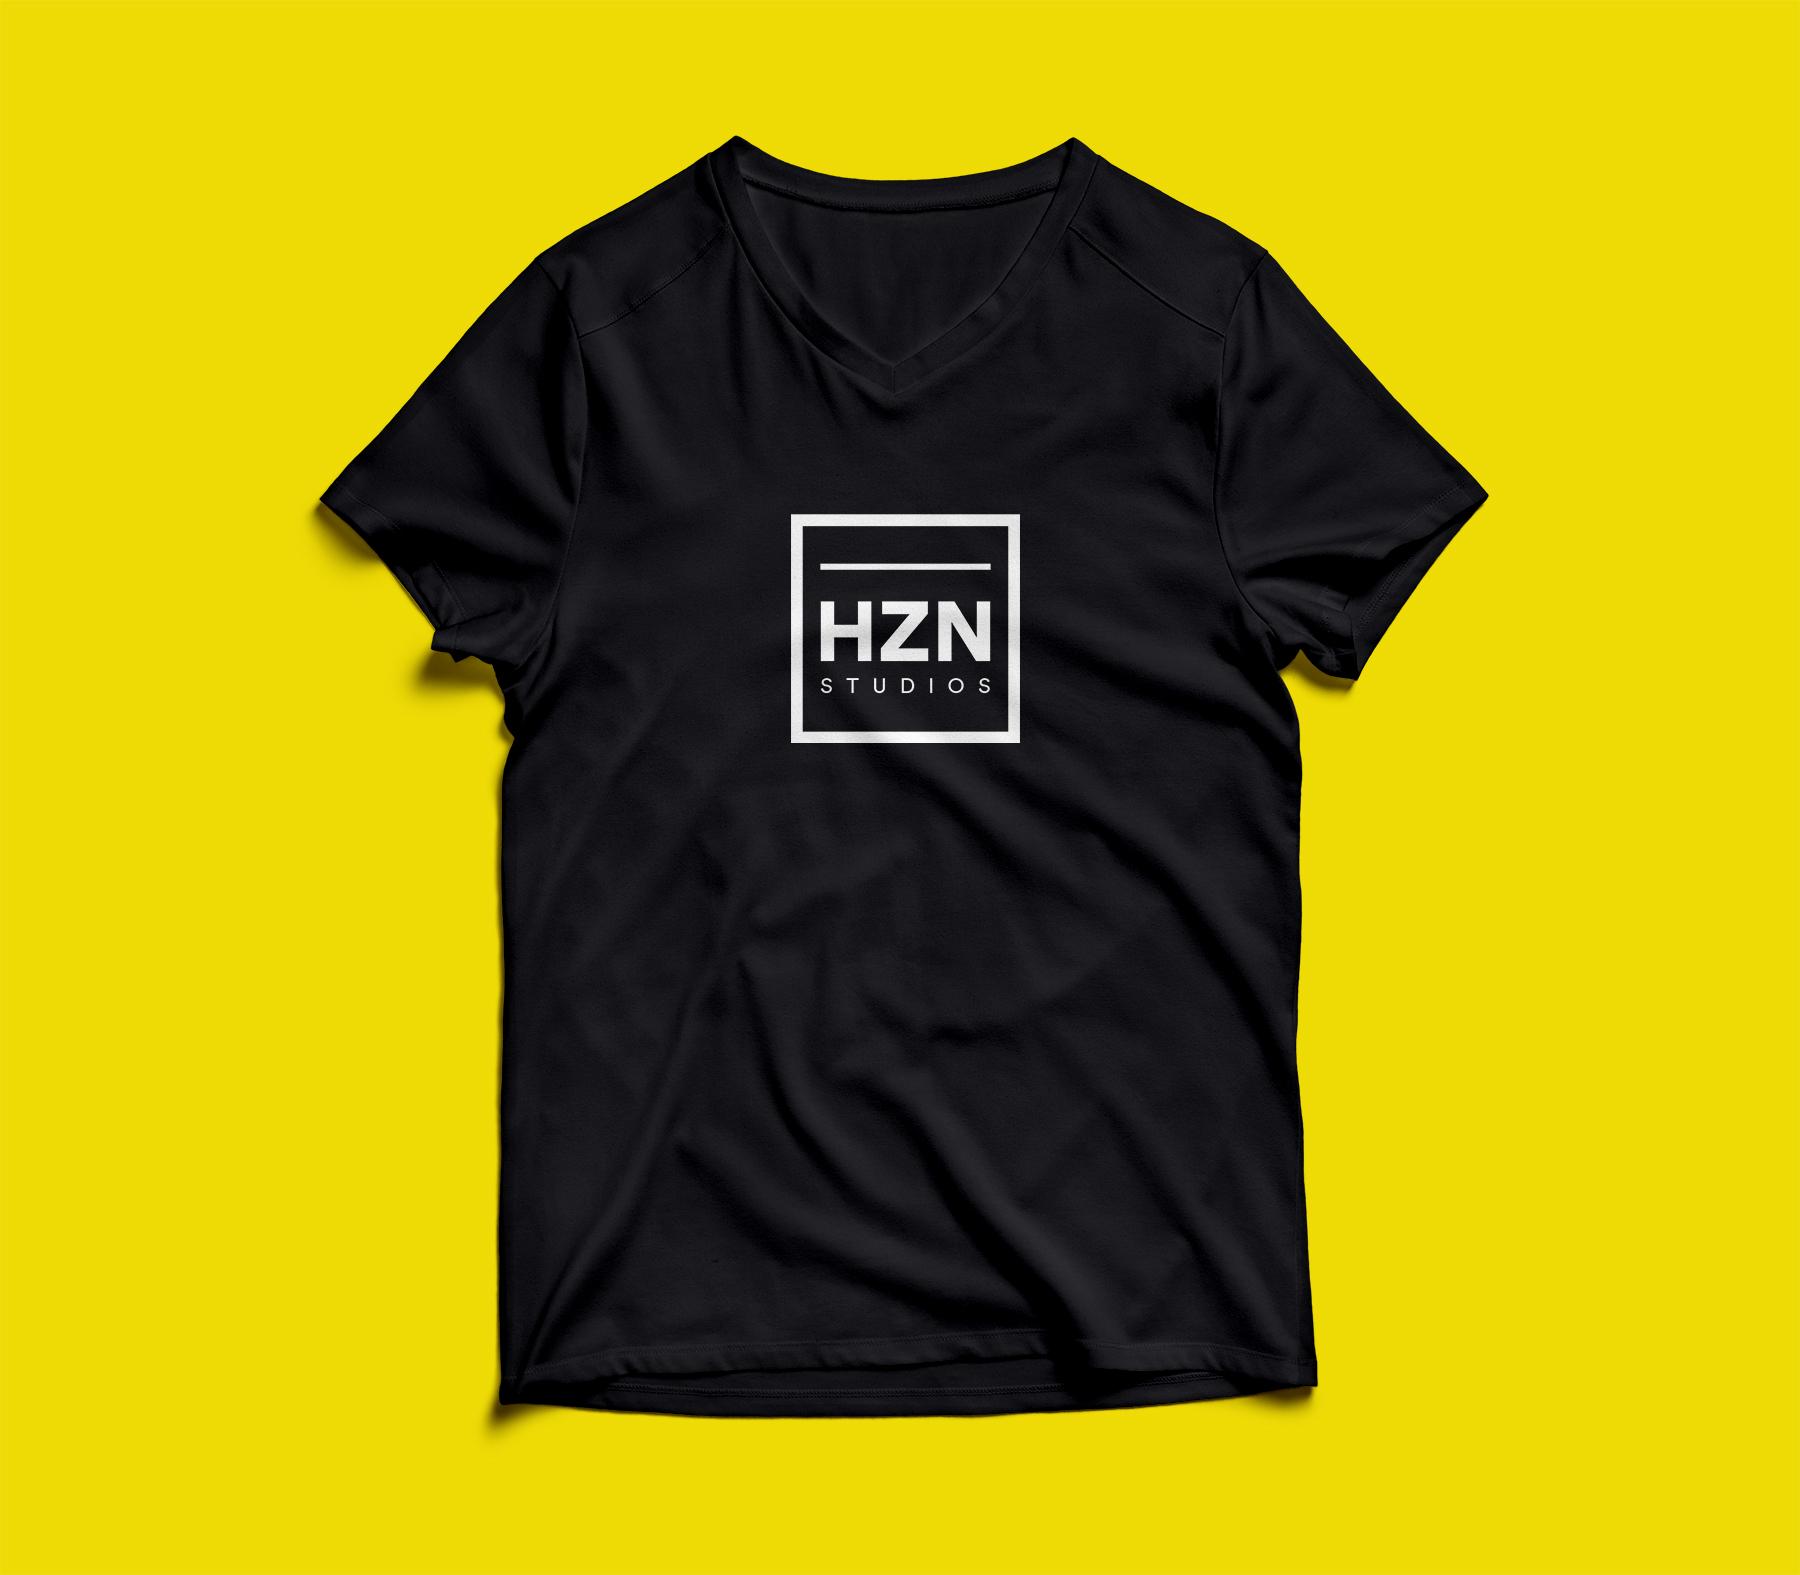 BLACK_Shirt FRONT.jpg